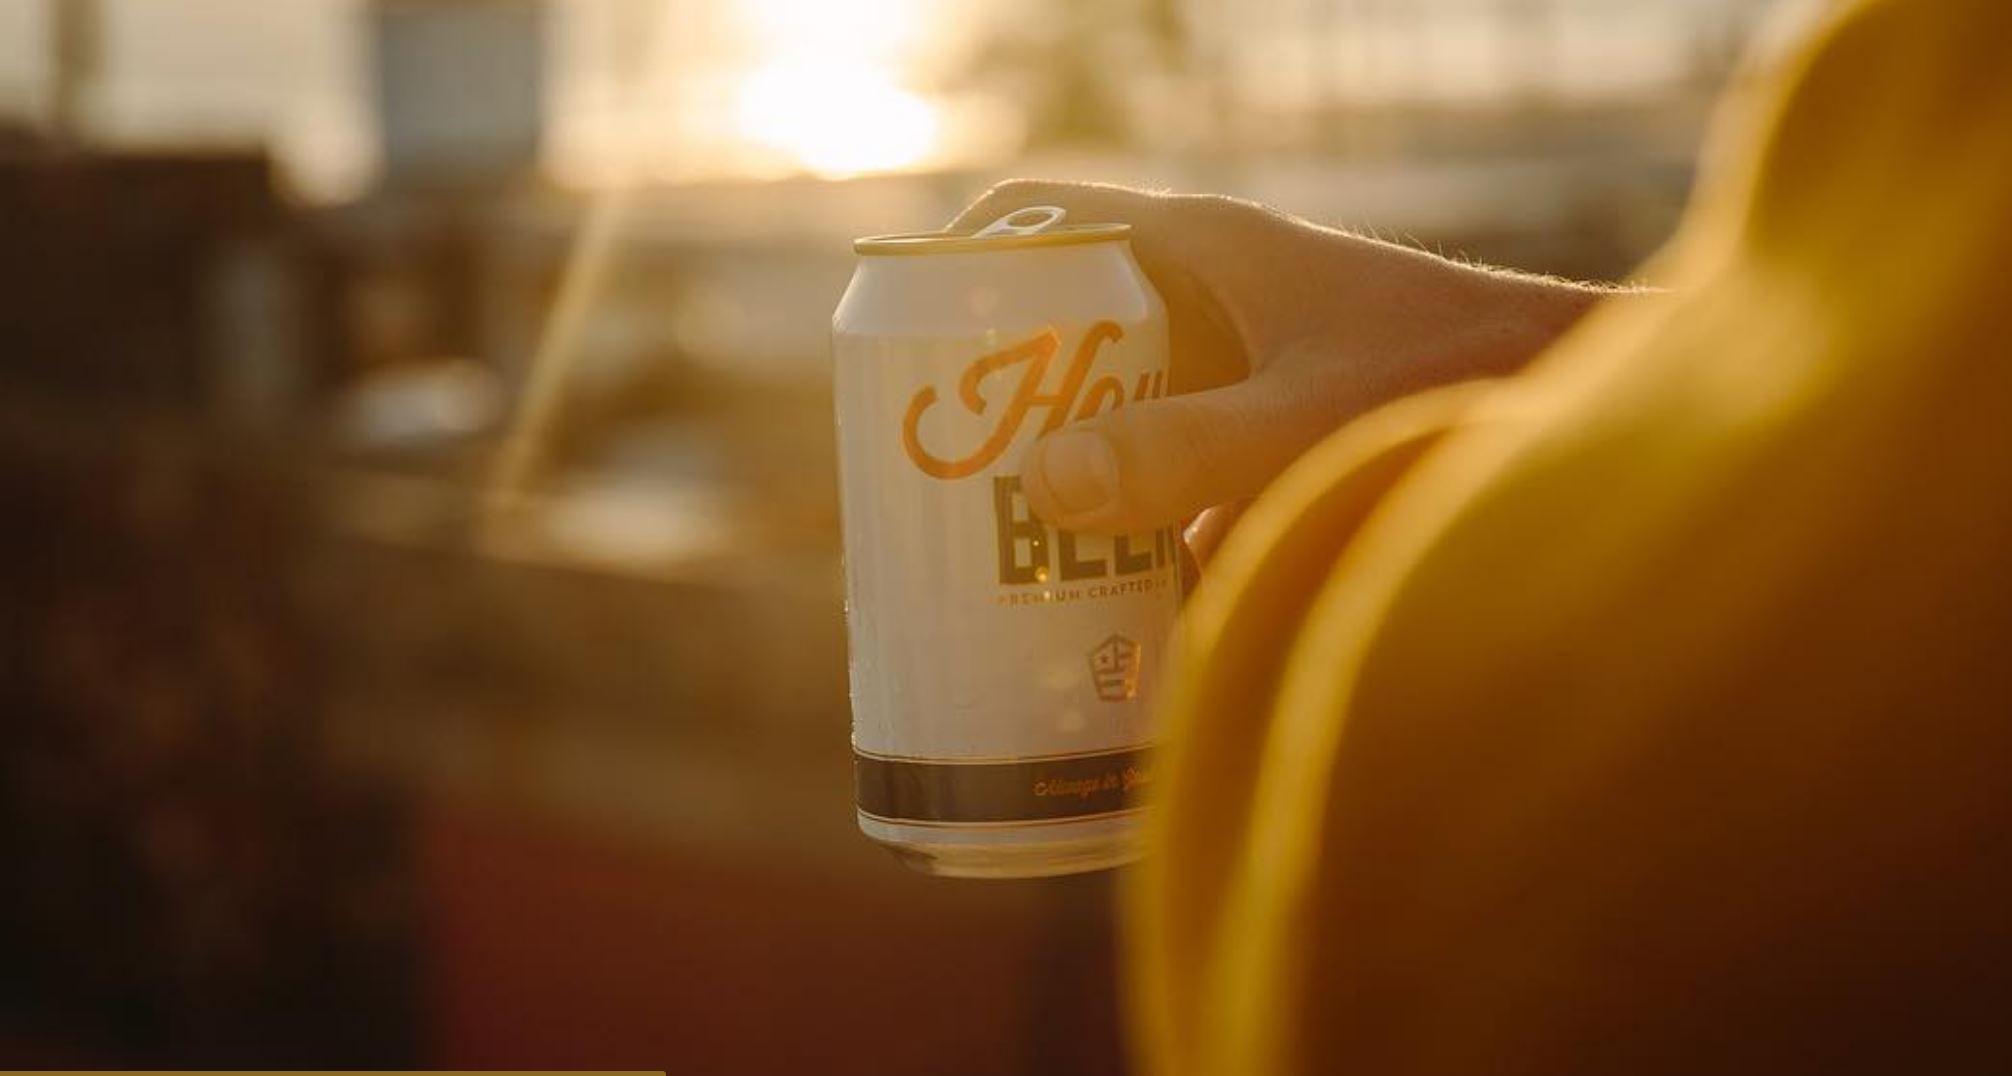 Source: House Beer